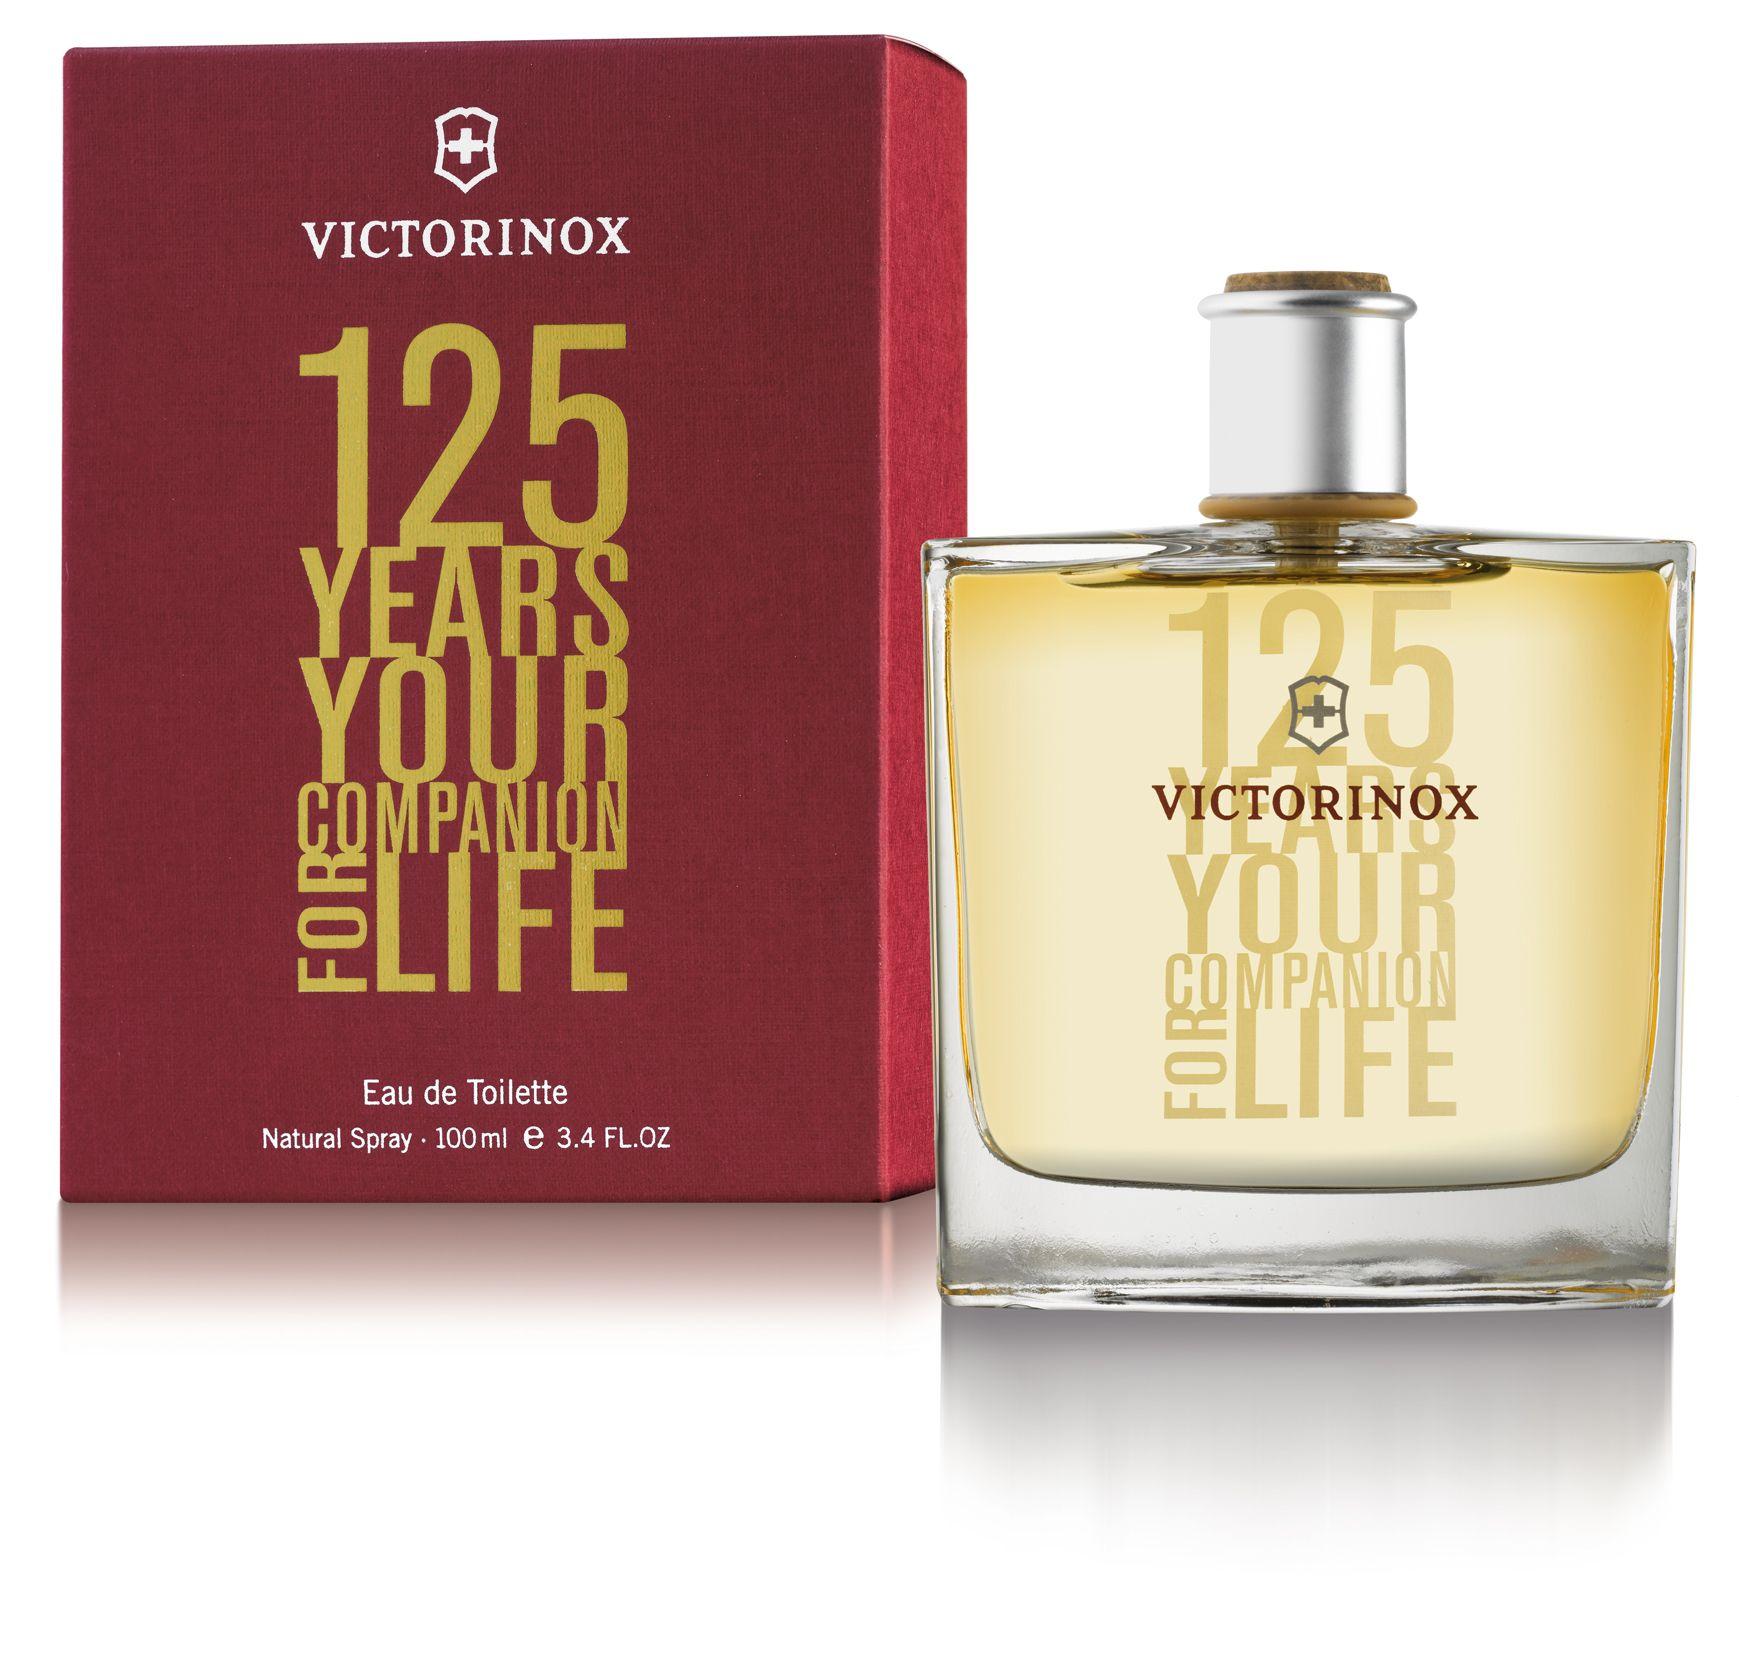 2009 Fragrances Vx130Years Perfume, Fragancia, Eau de